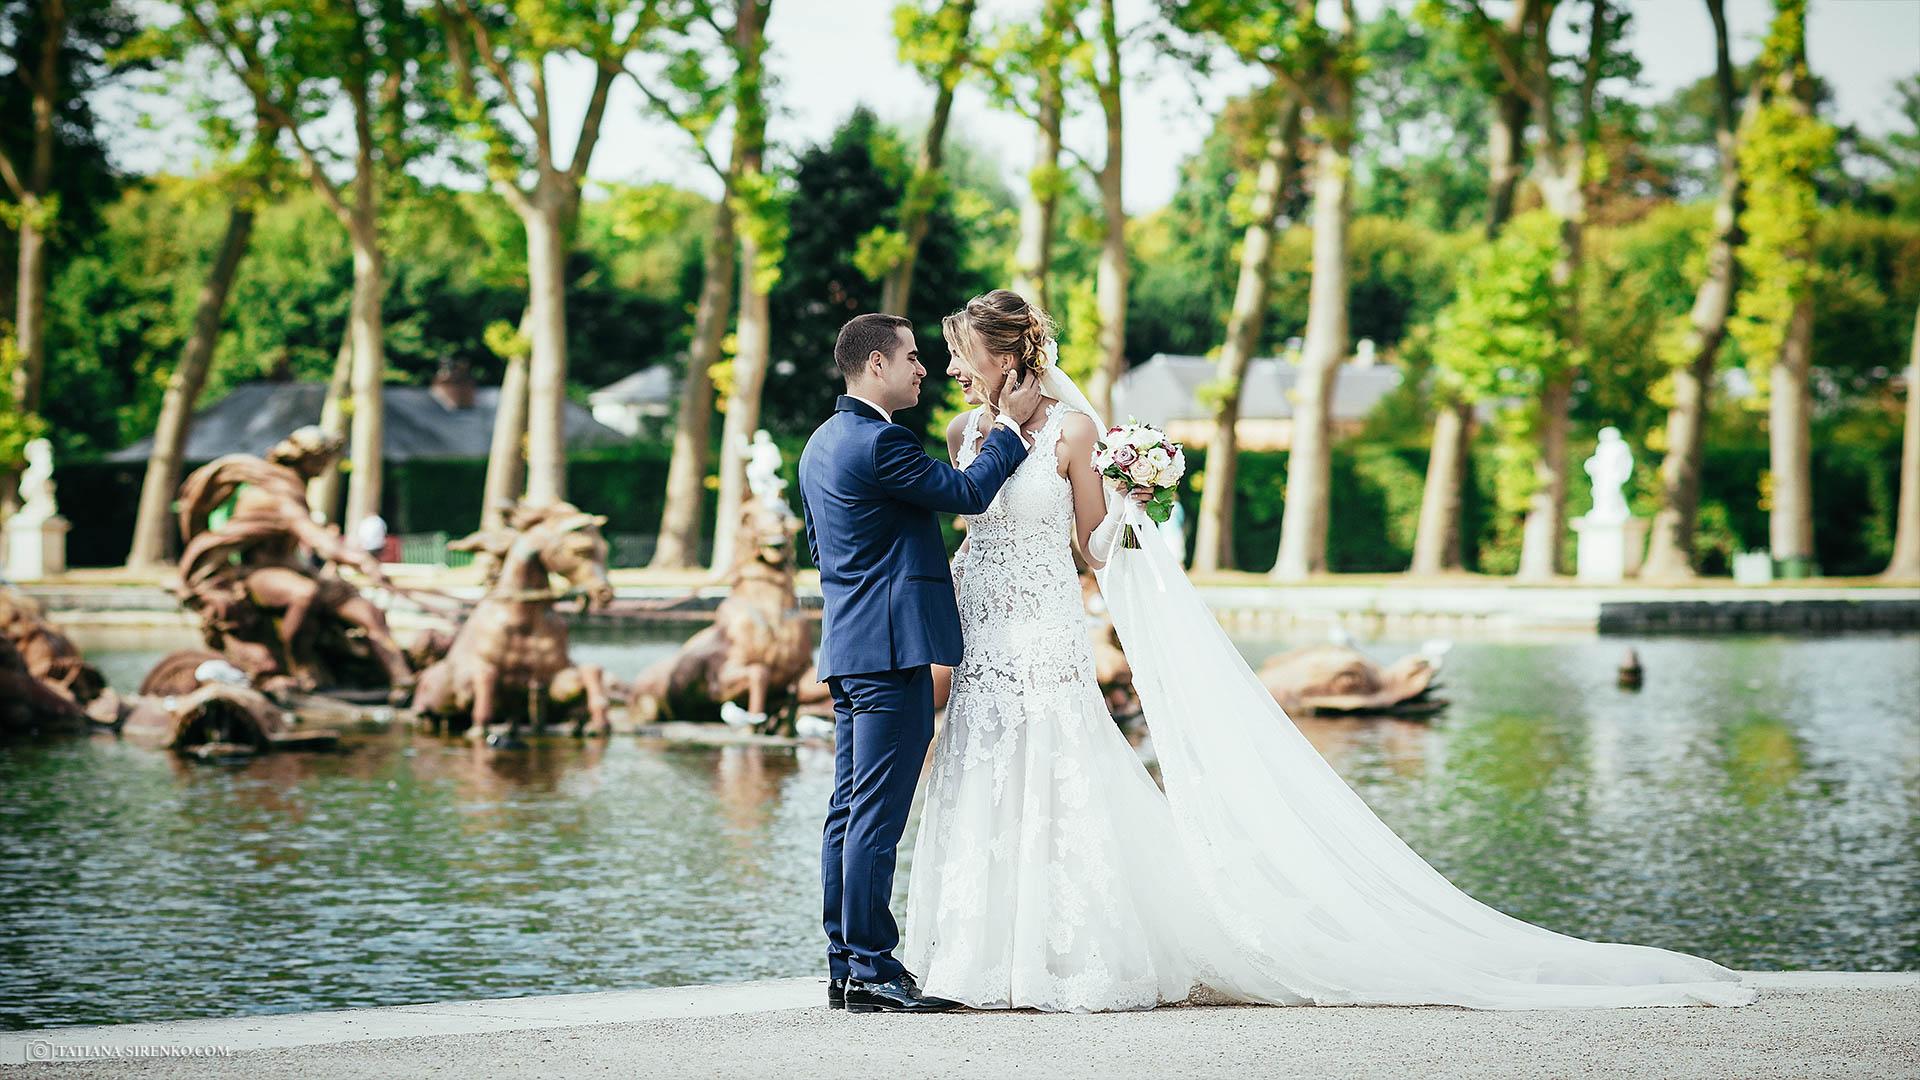 Свадебная фотосъемка в Париже